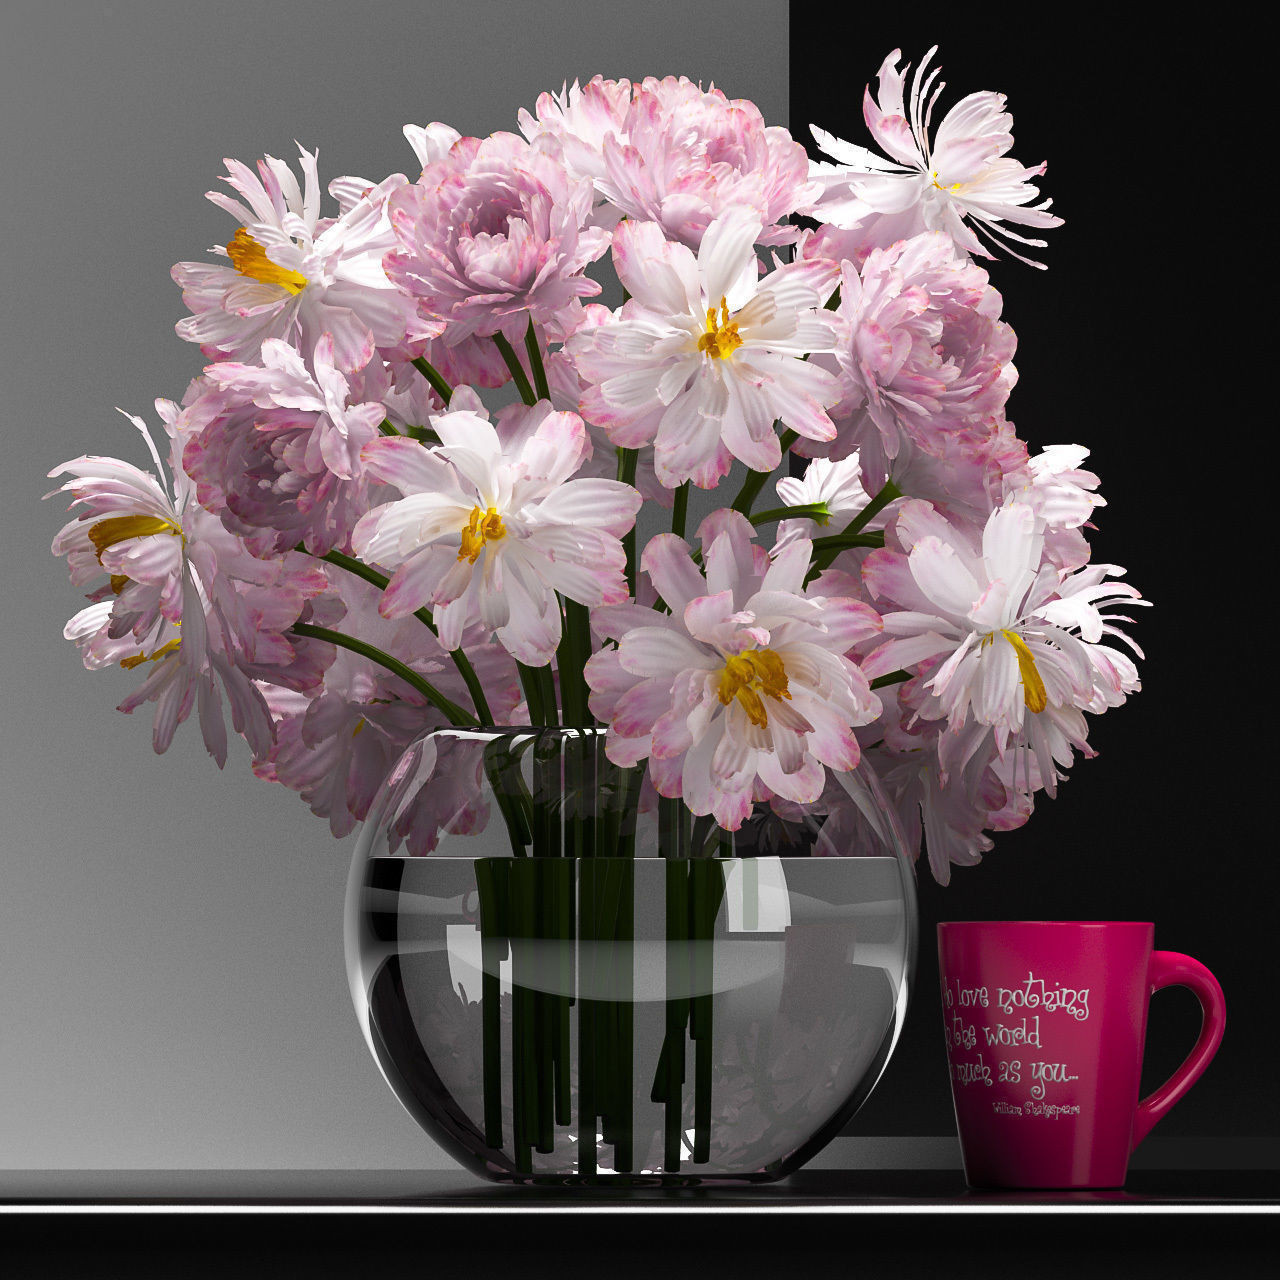 antique wall pocket vases of antique flower vase images baby shower table settings decor color in antique flower vase collection wrh 20preview 2001h vases 3d flower vase preview 01 jpg i 0d